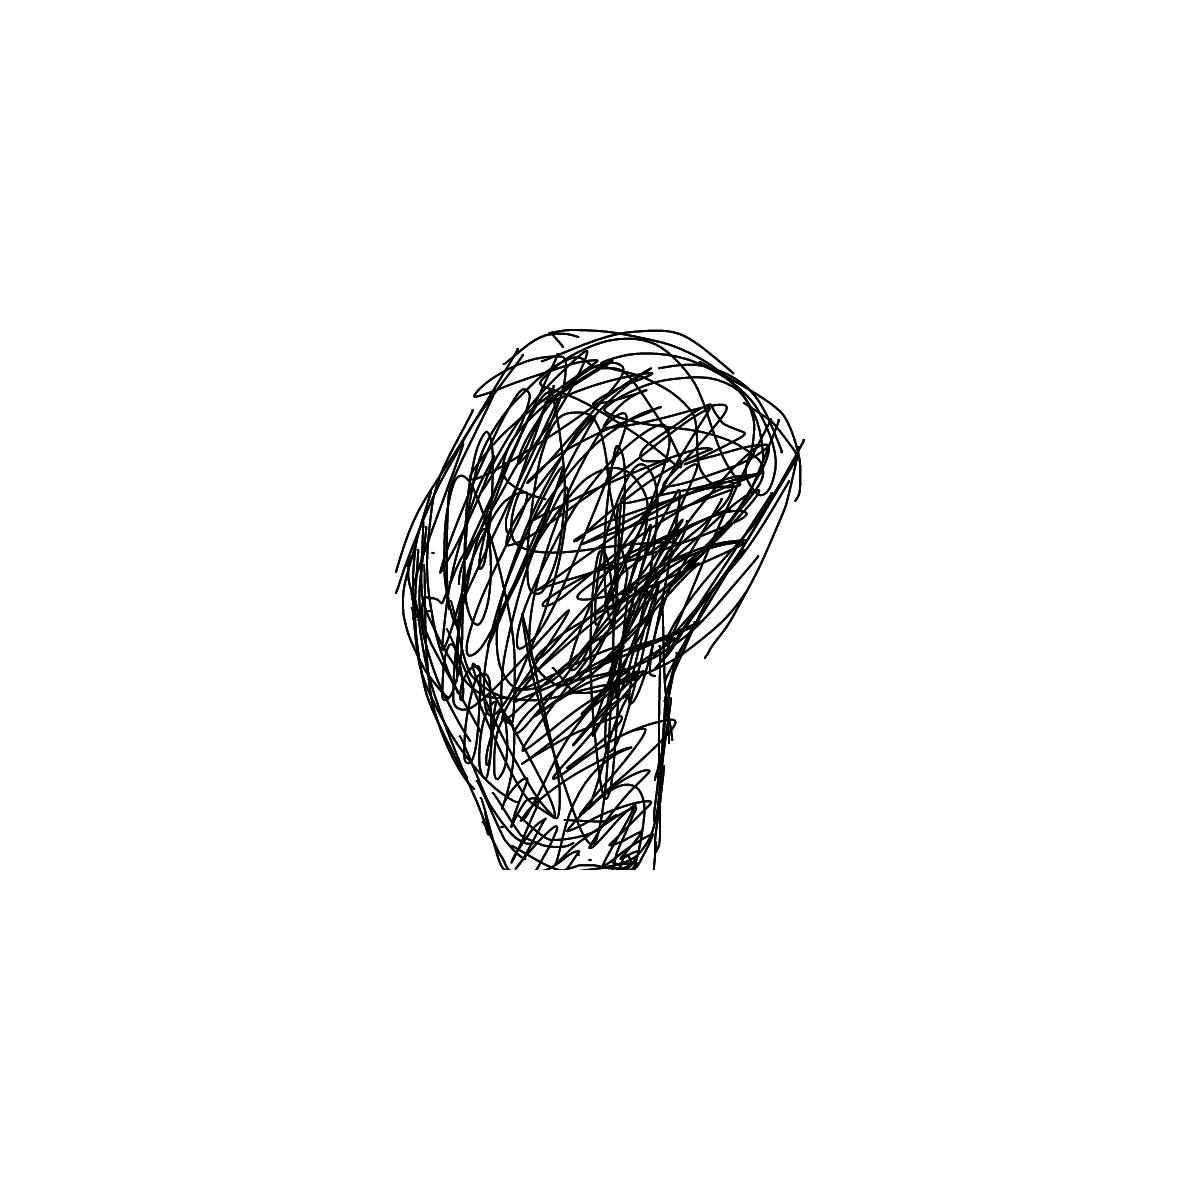 BAAAM drawing#18209 lat:32.9991722106933600lng: -96.7087402343750000